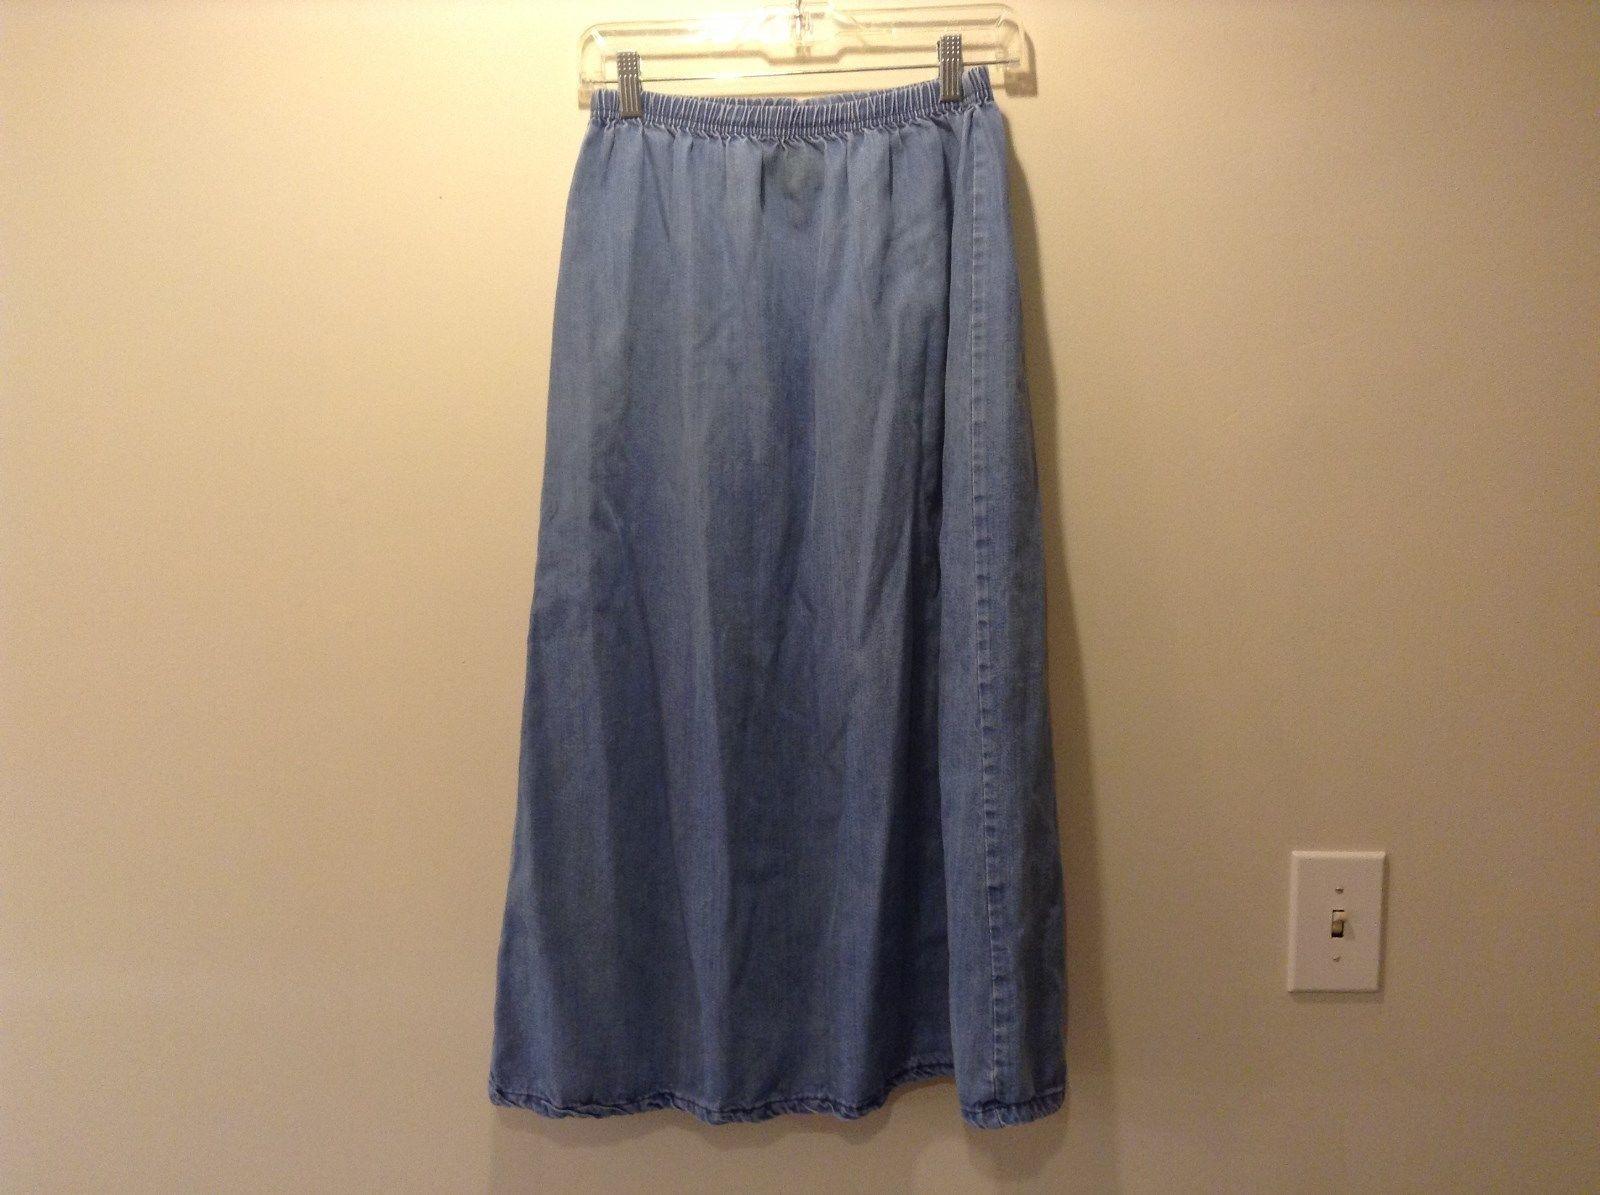 Blue Rue de Pare Denim Long A Line Skirt Size Medium Elastic Waist